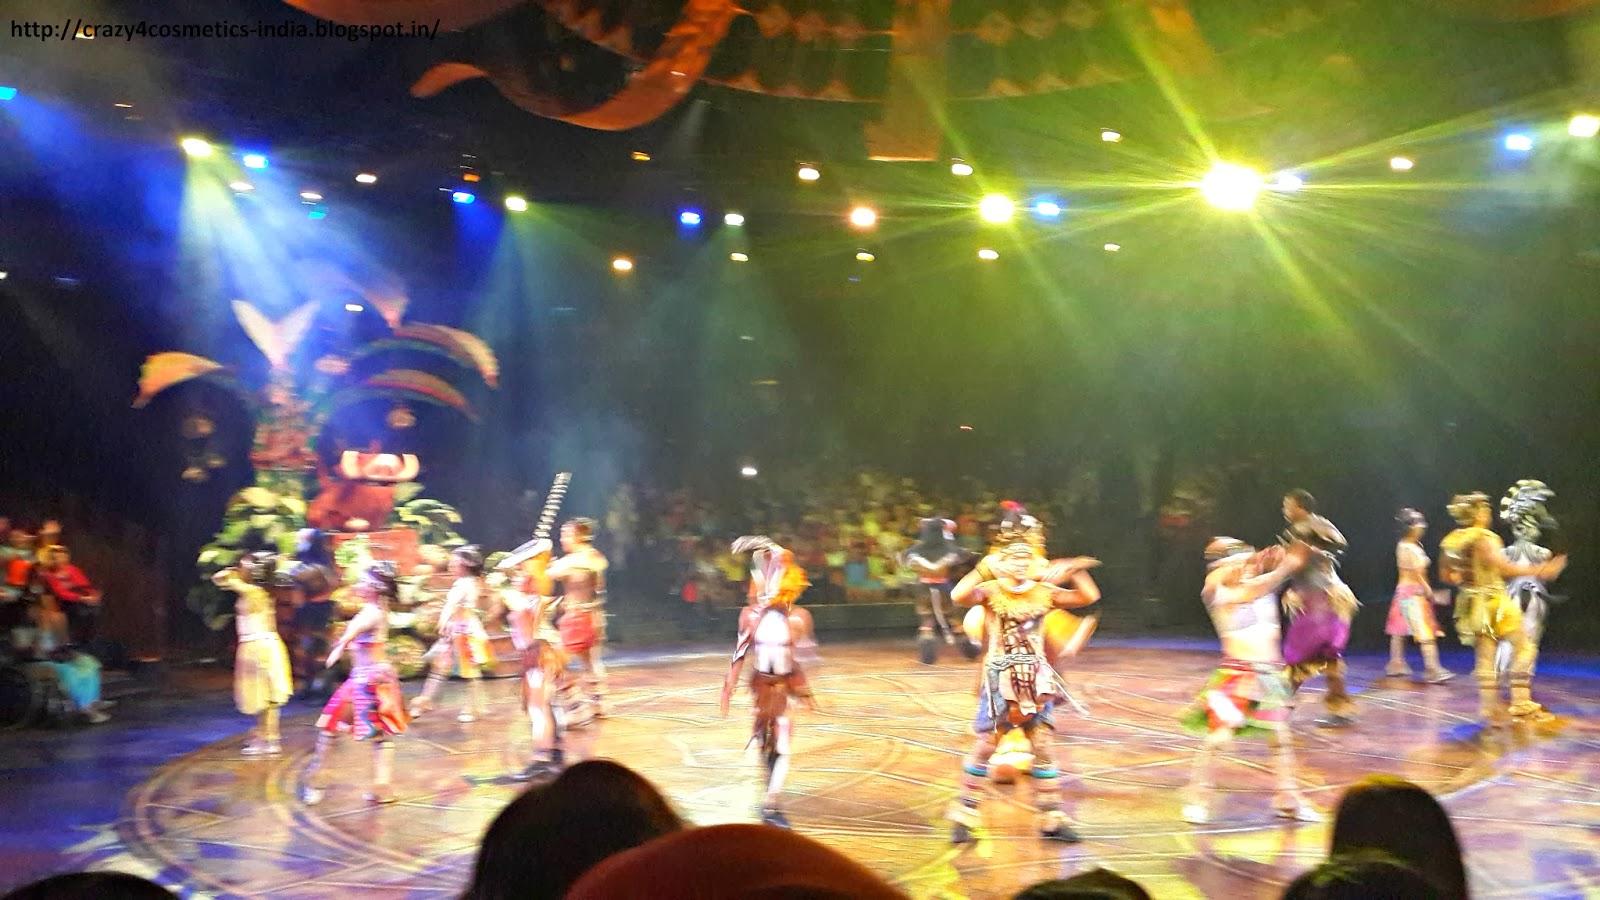 Hongkong Disneyland Lantau Island- Sunny Bay- Lion King Show Disneyland